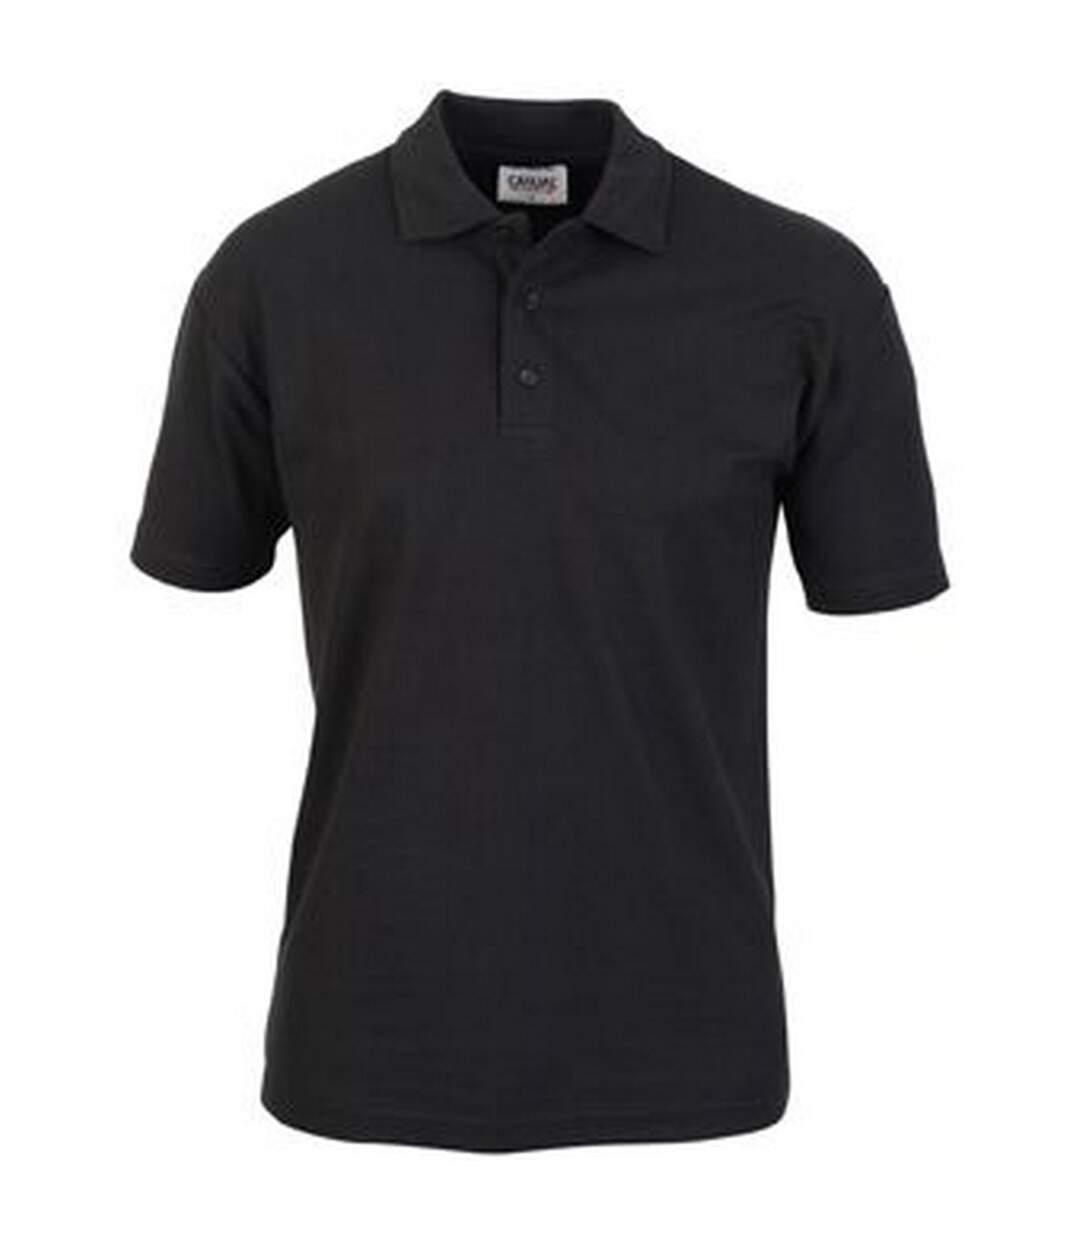 Casual Classic Mens Pique Polo (Black) - UTAB252